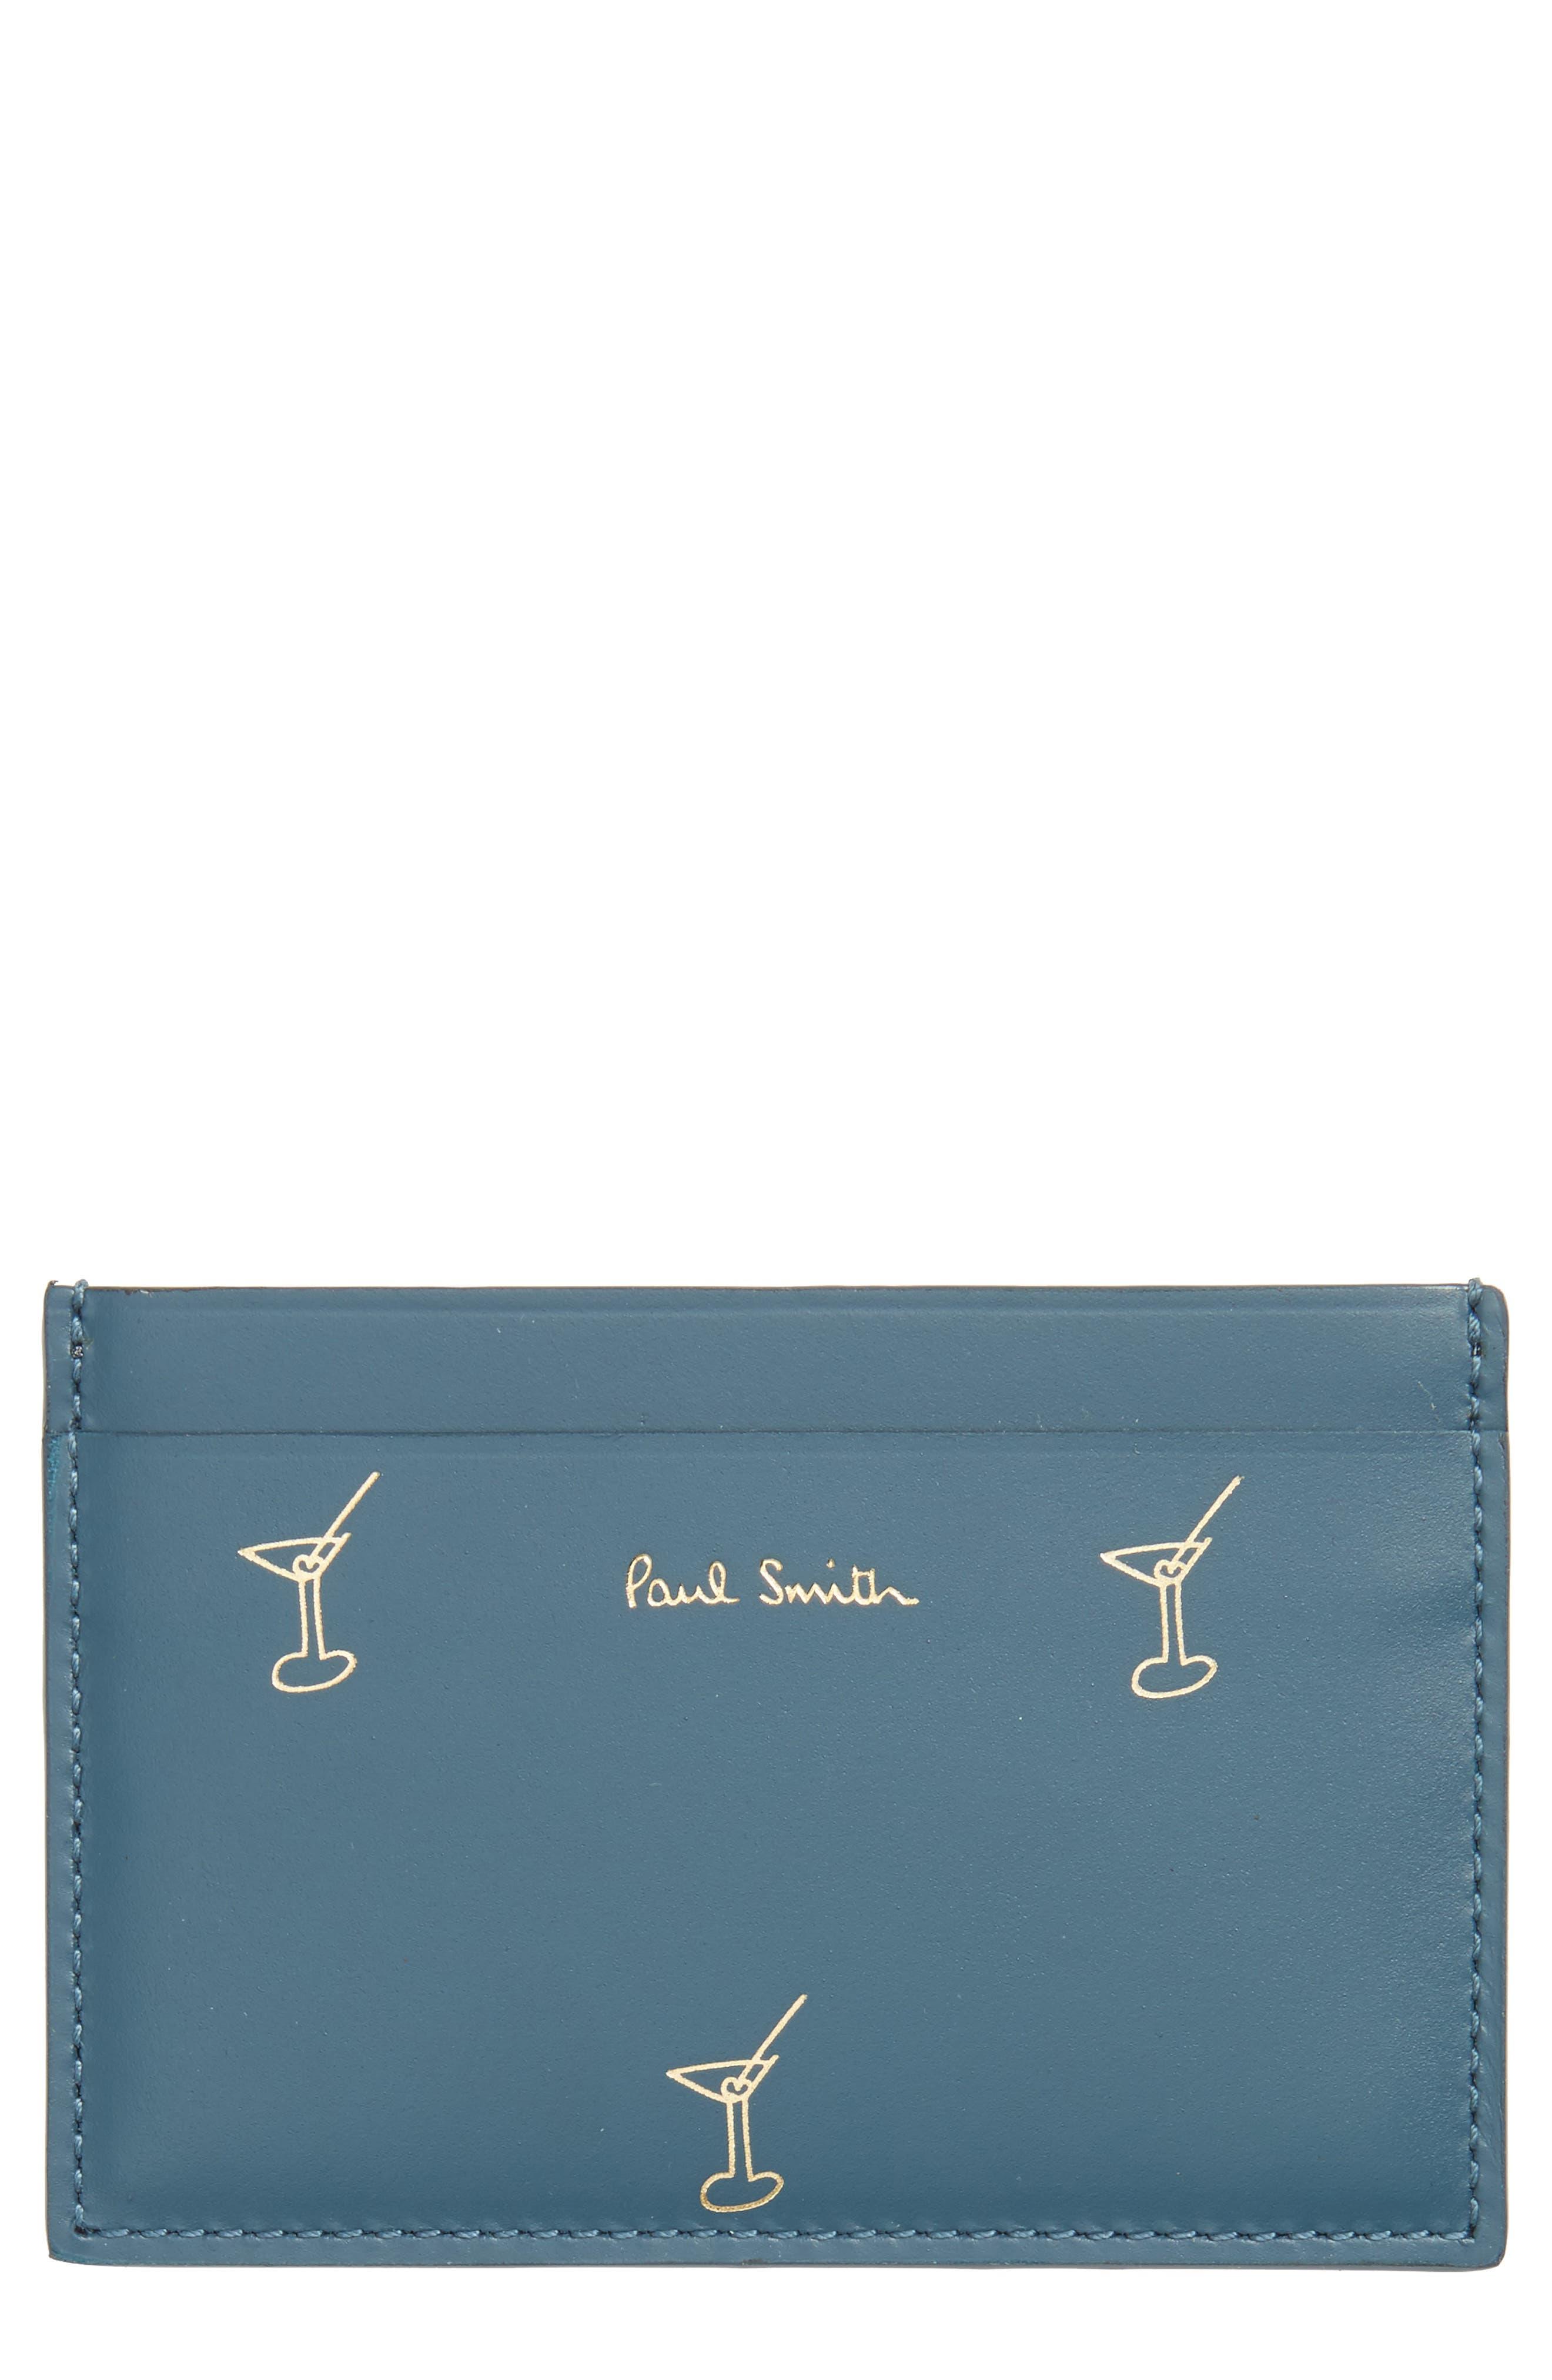 Doodles Leather Card Case,                         Main,                         color, Blue Multi